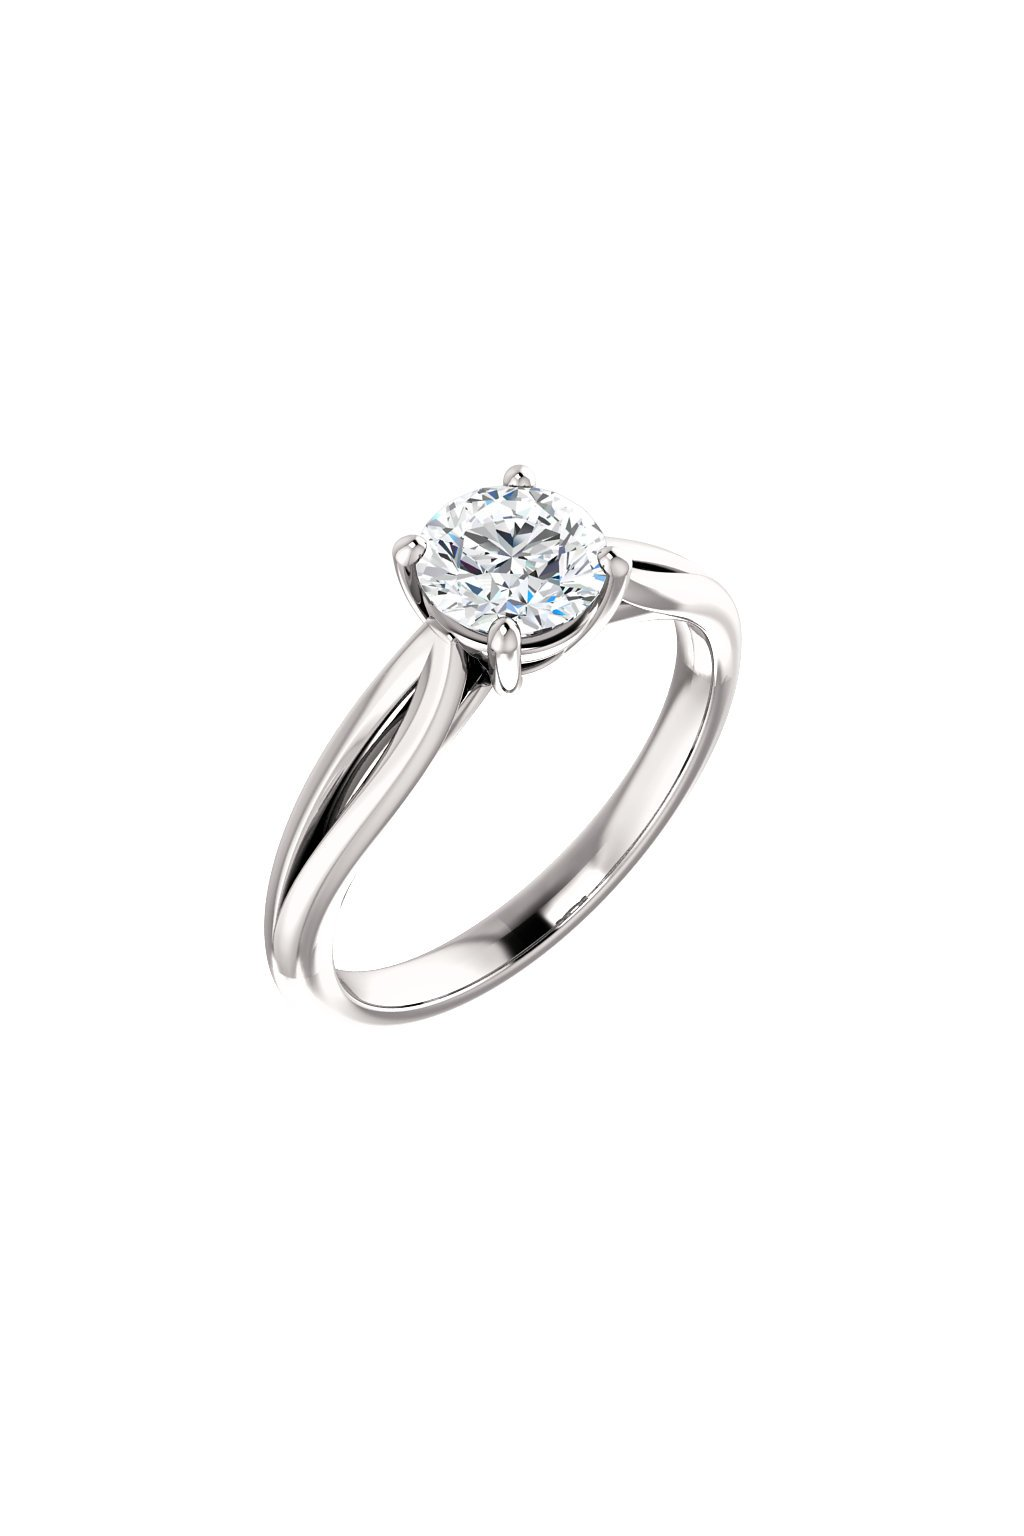 Zásnubní prsten ROYALIS AURA s Diamantem